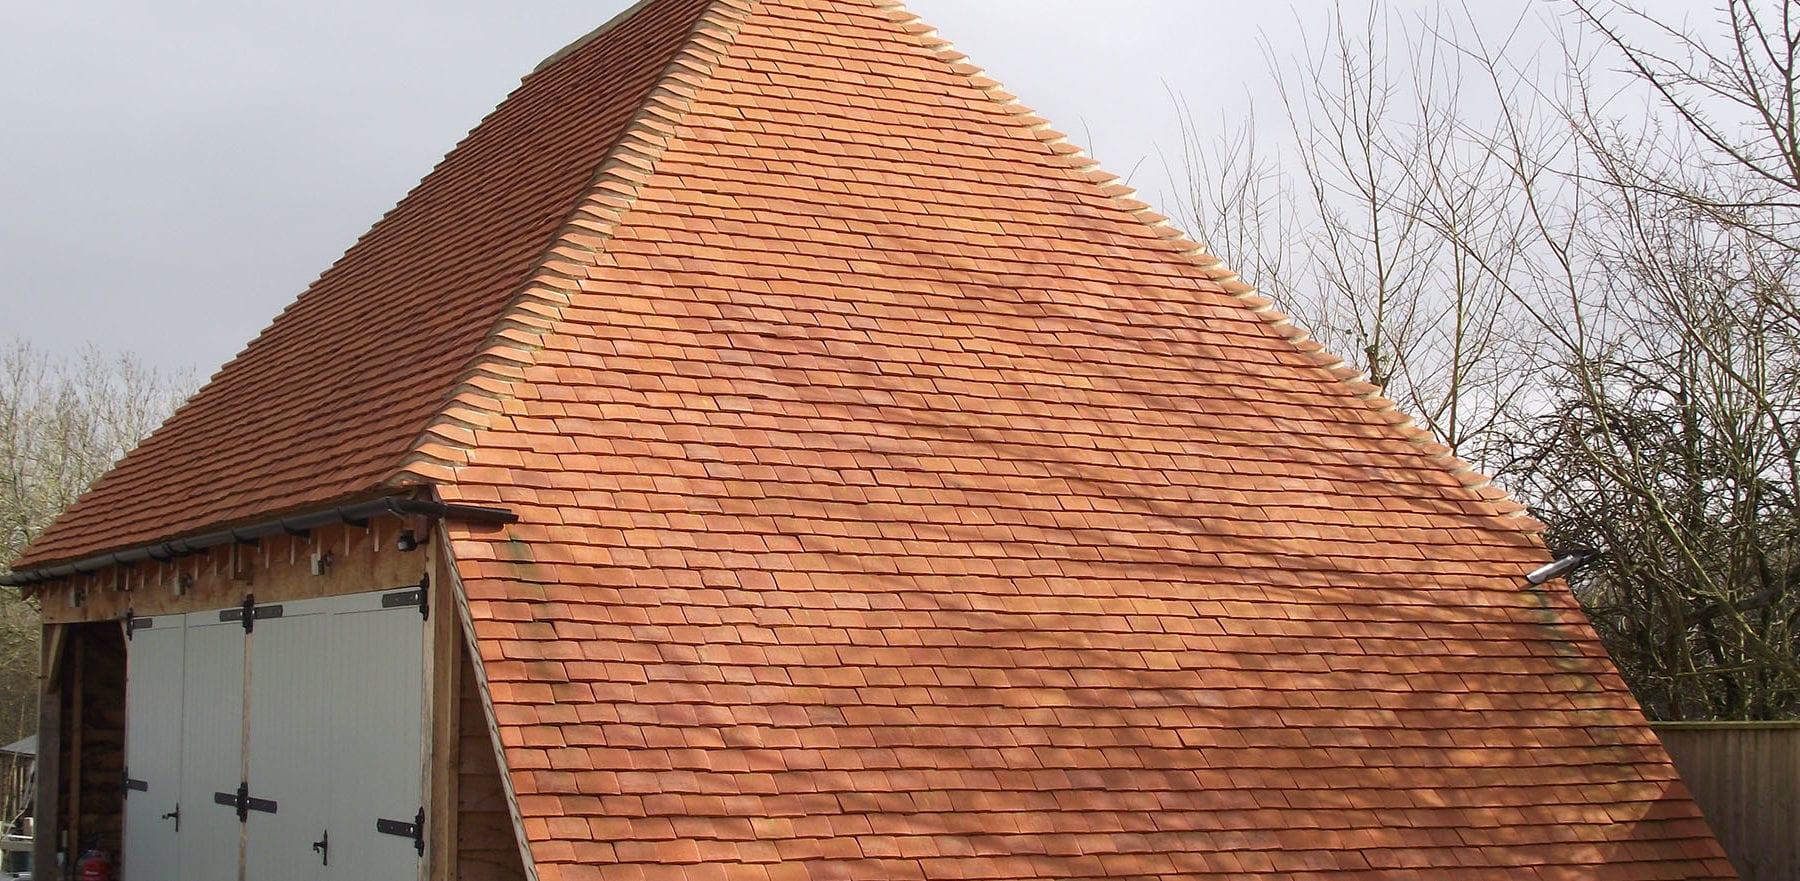 Lifestiles - Handmade Orange Clay Roof Tiles - Baughurst, England 5